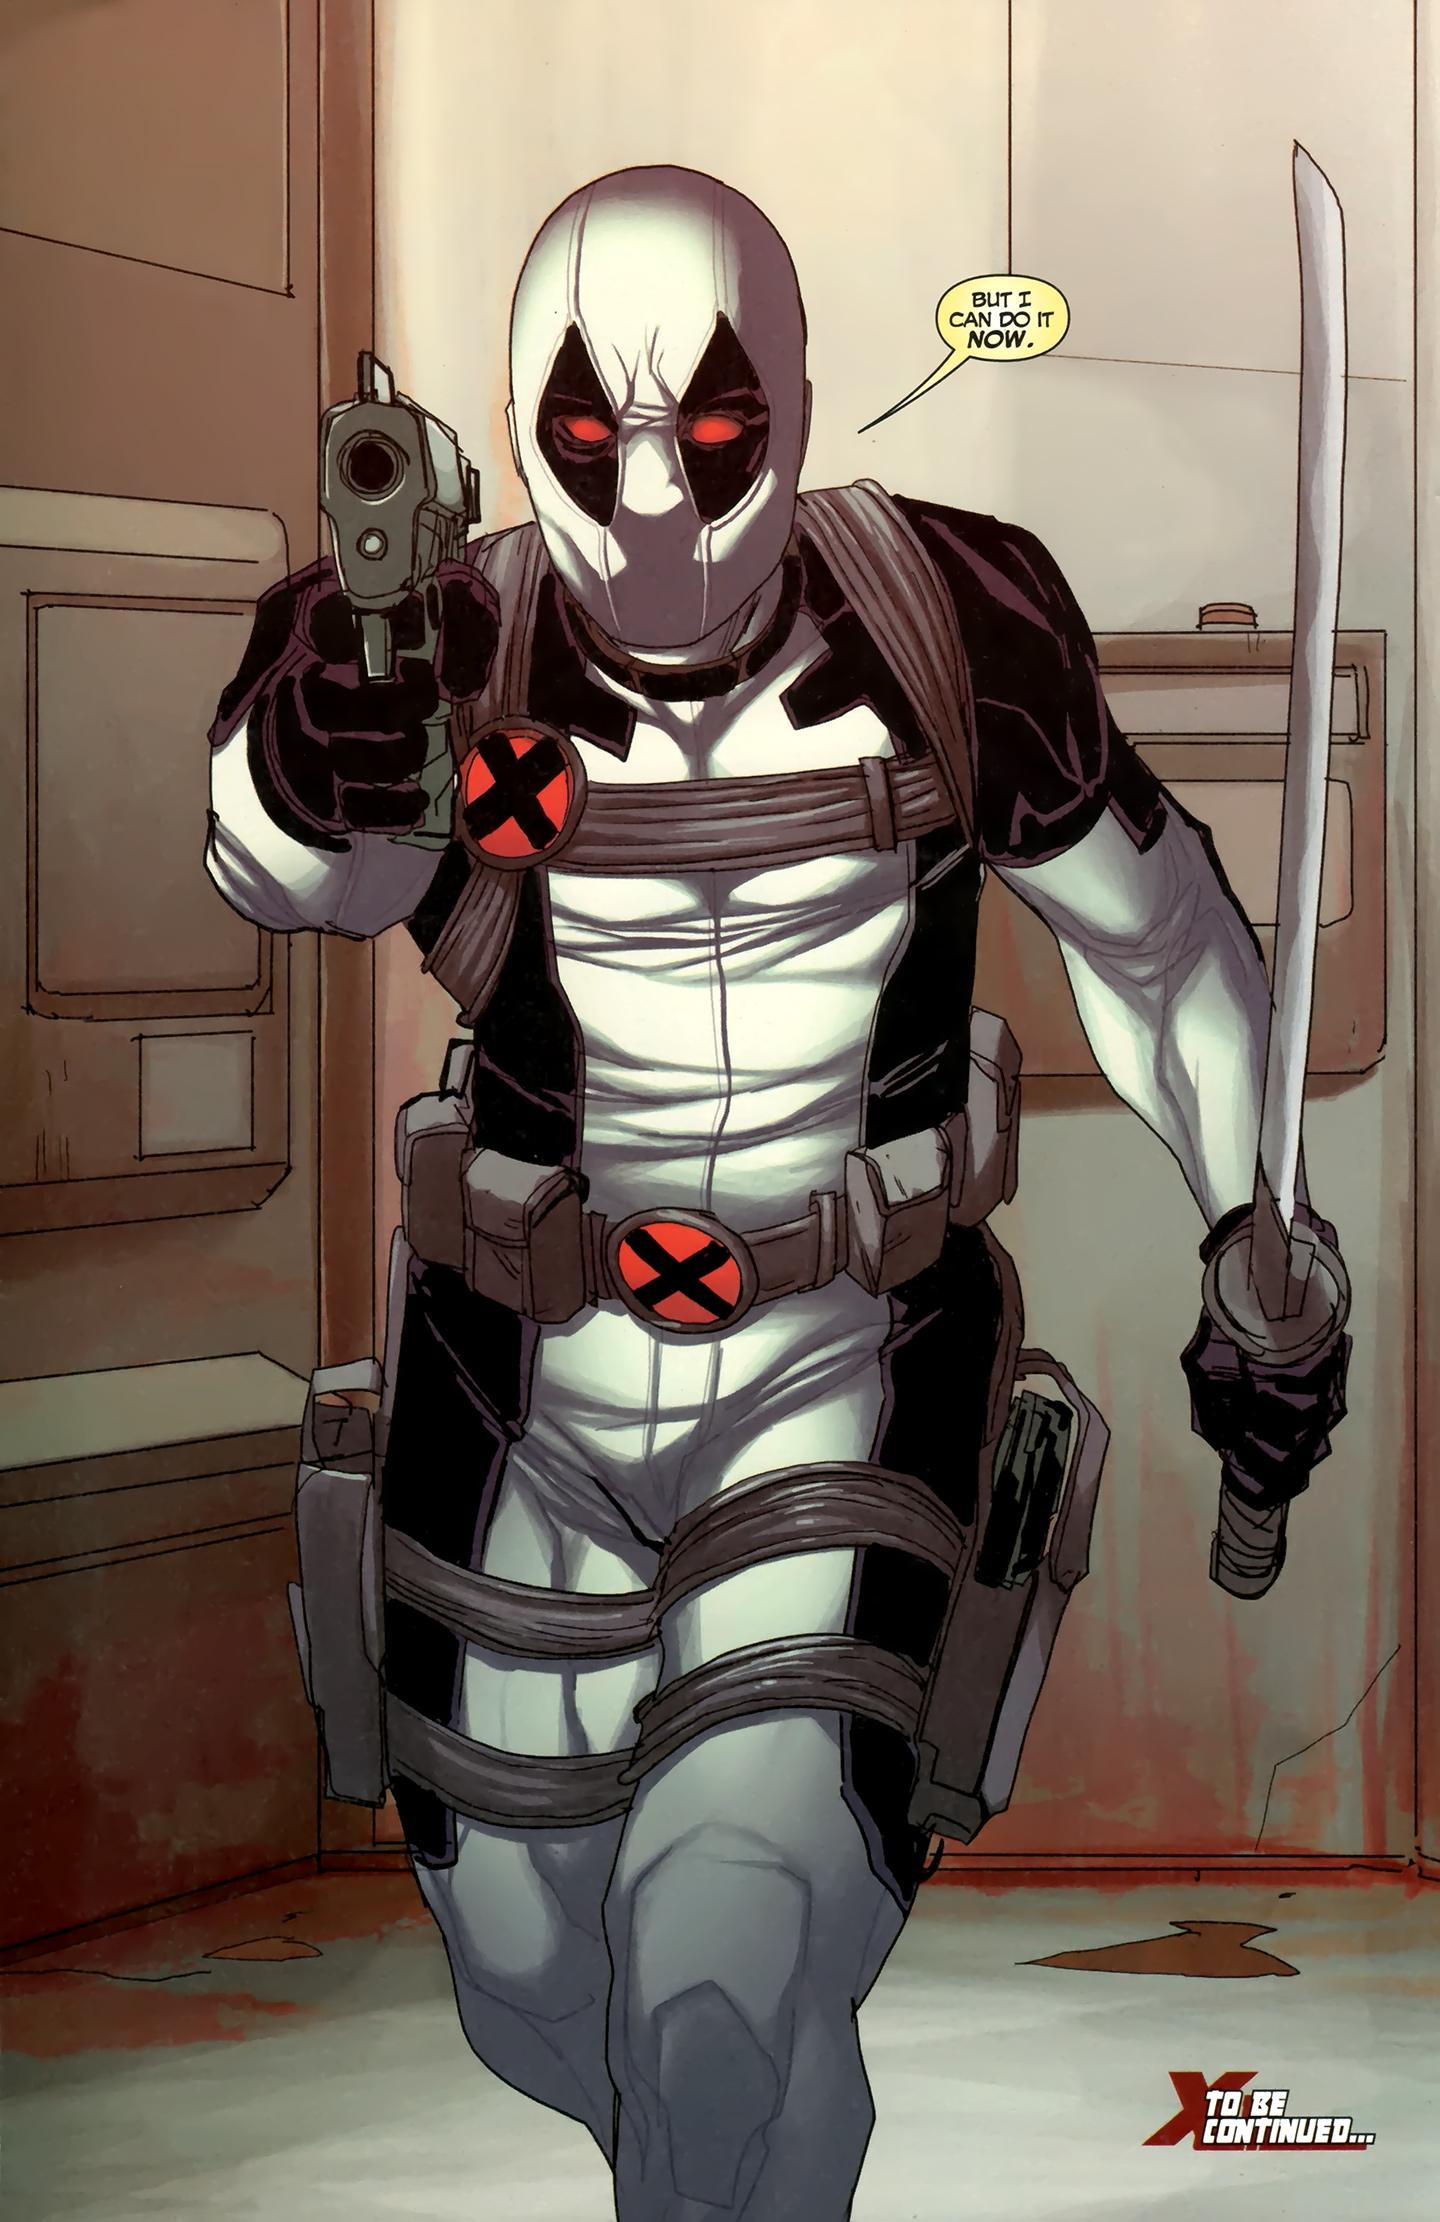 X Force Deadpool Image - Deadpool (Wade...